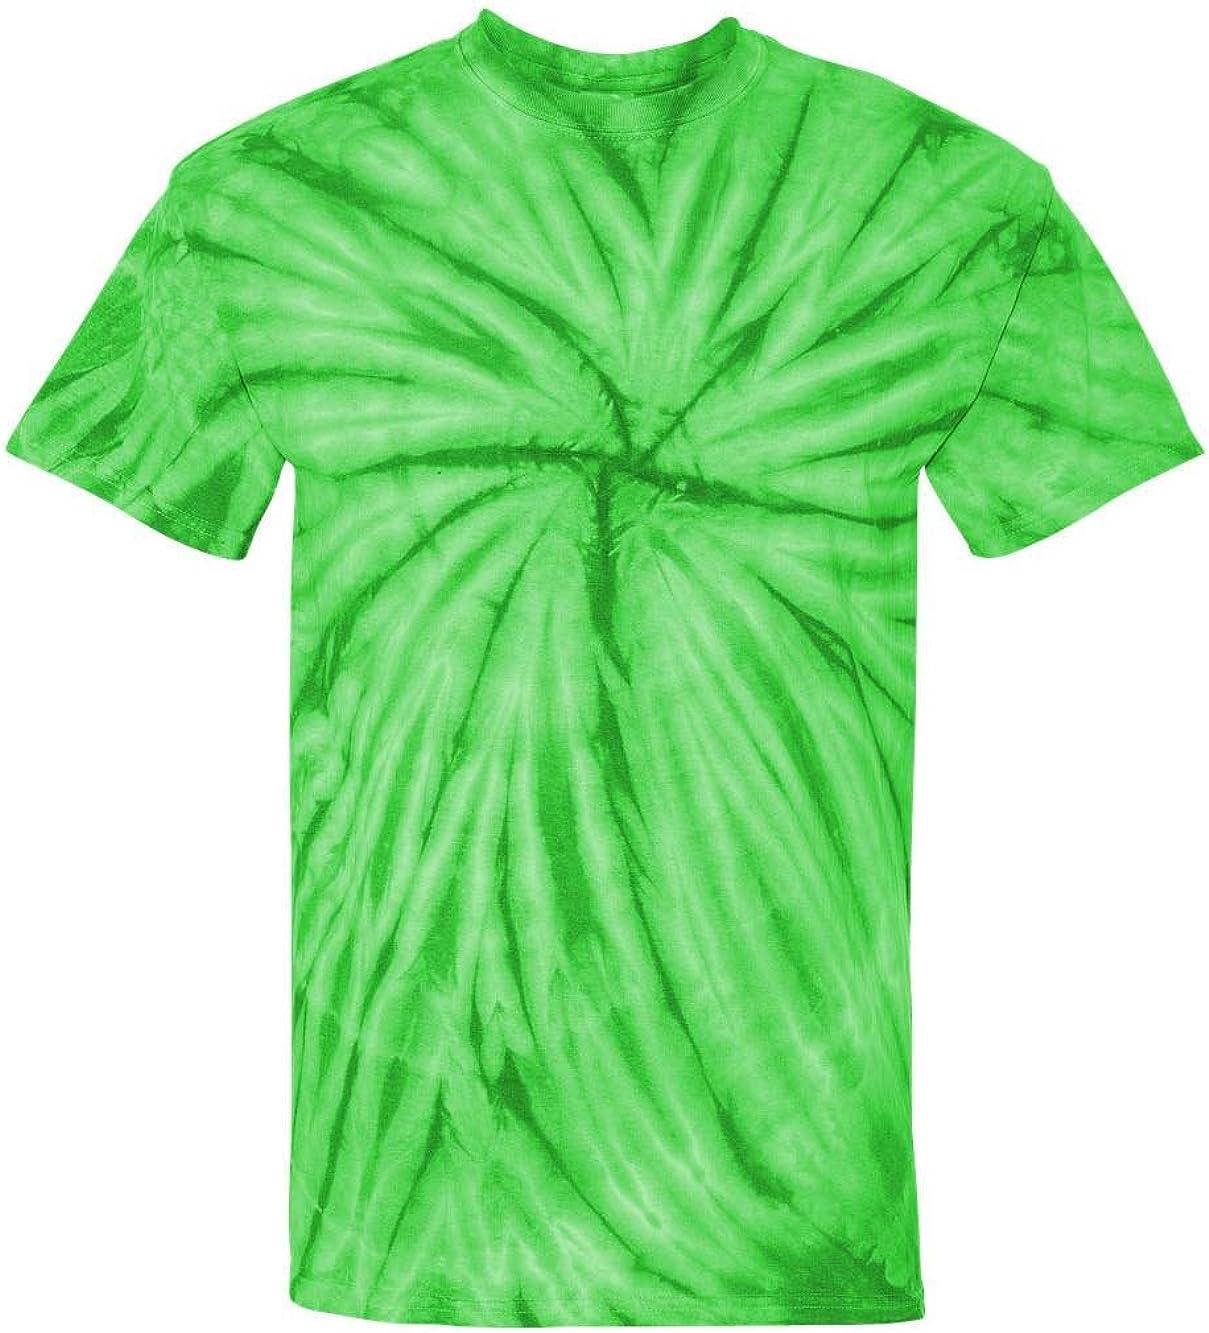 Tie-Dyed Cyclone Pinwheel Short Sleeve T-Shirt 200CY 100/% pre-shrunk cotton SALE